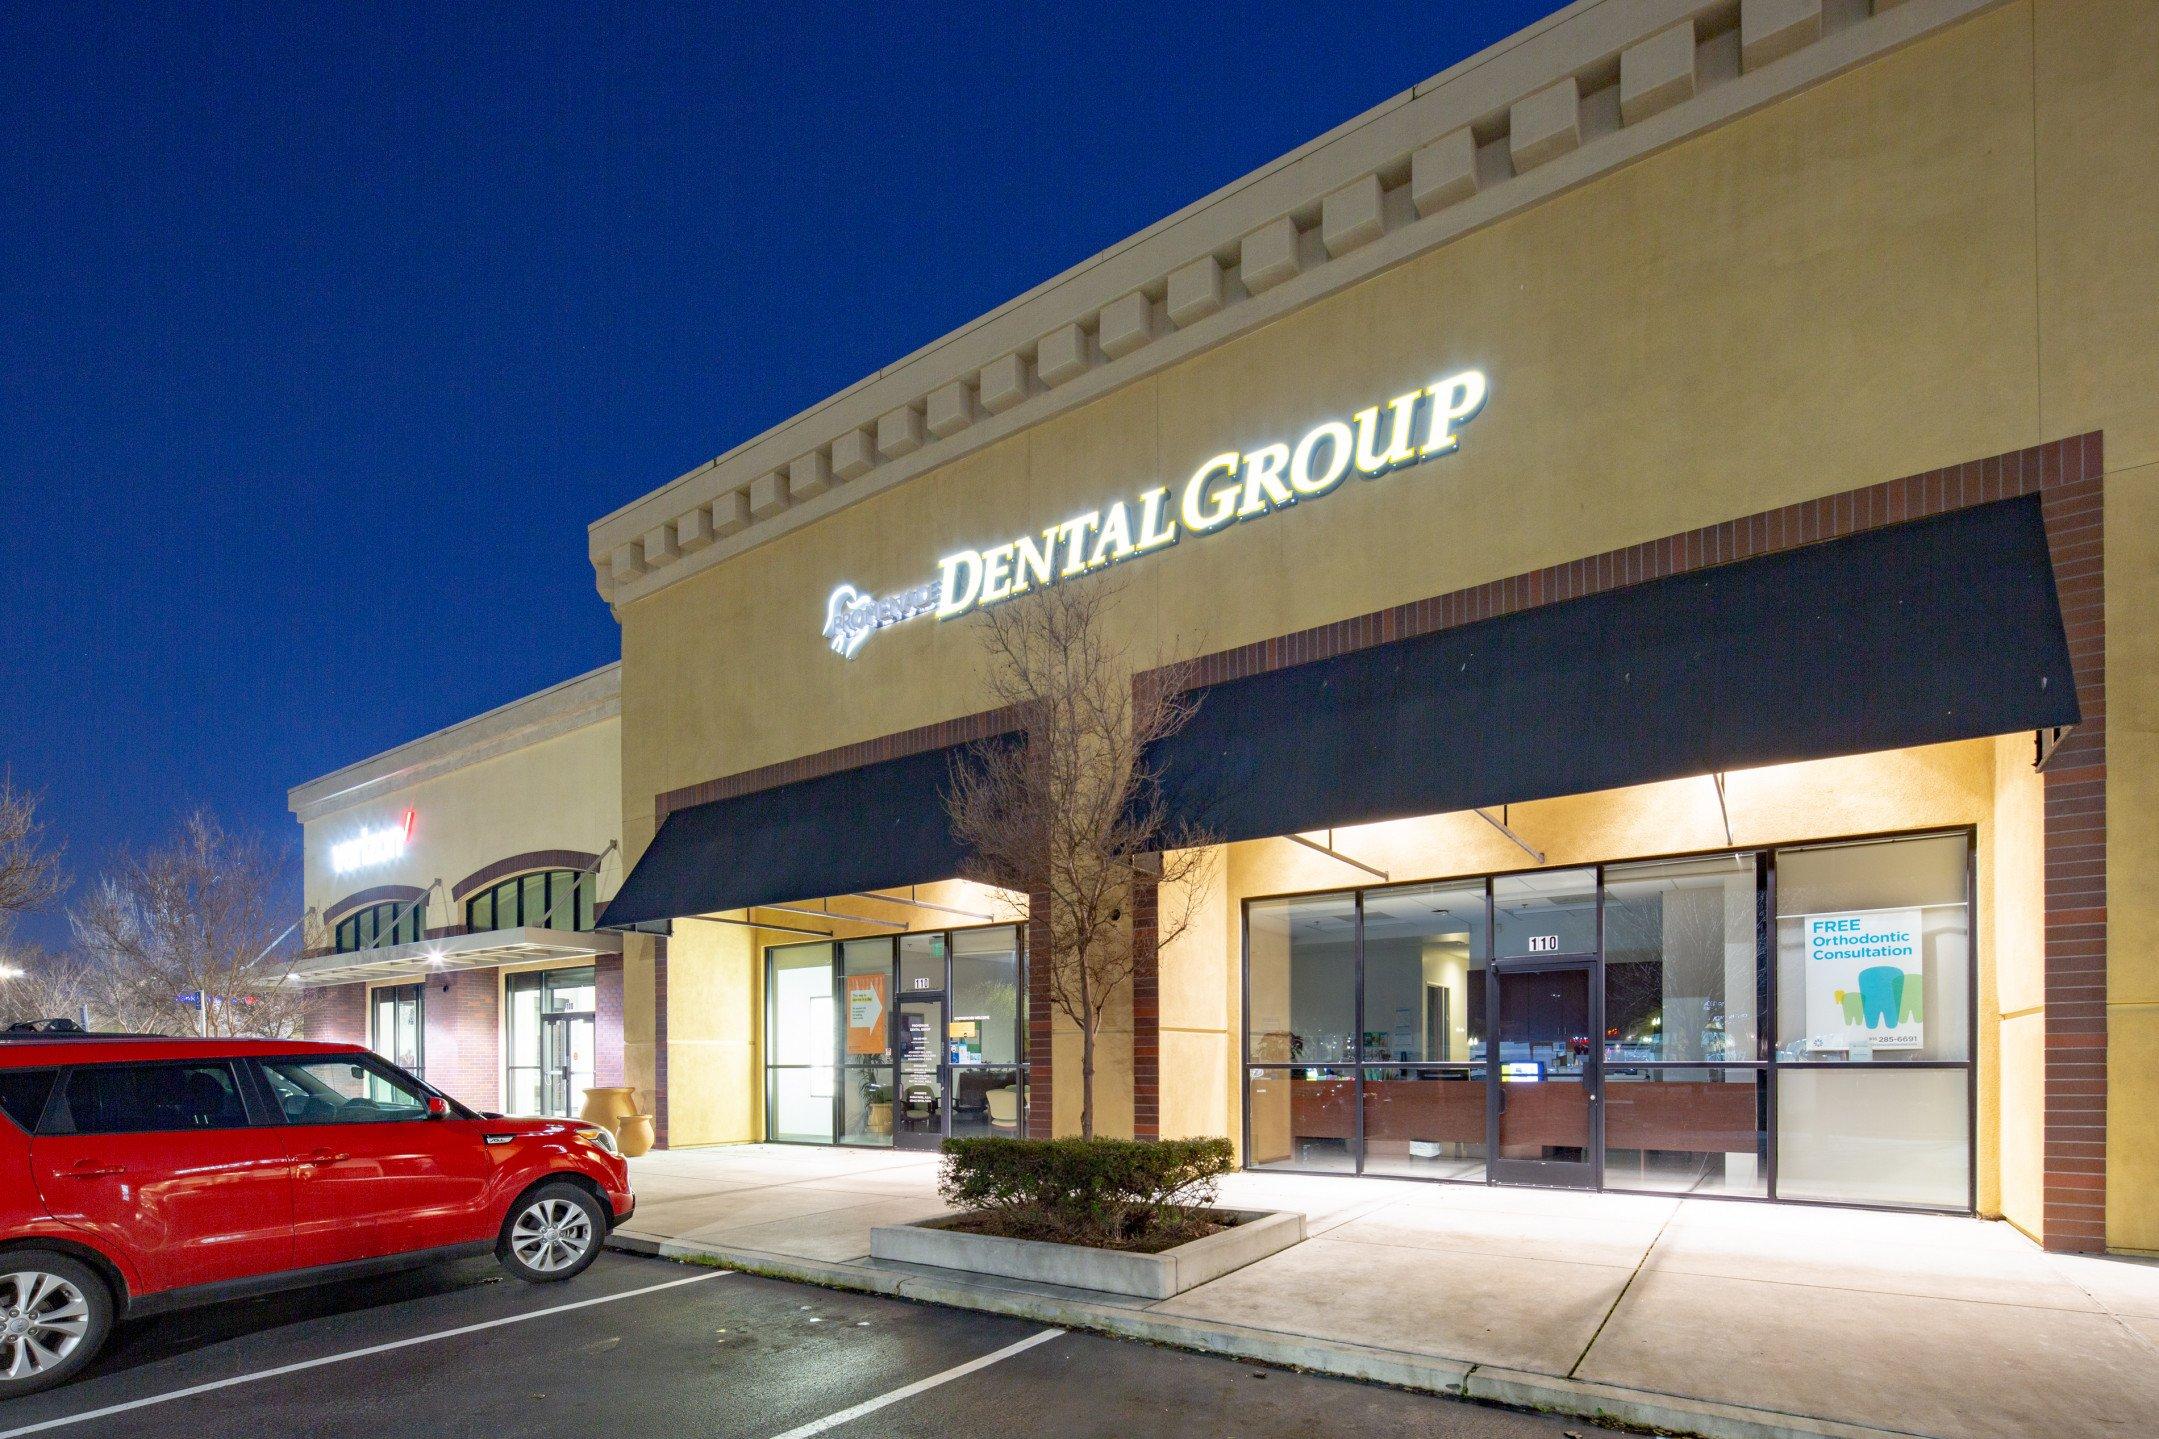 Promenade Dental Group